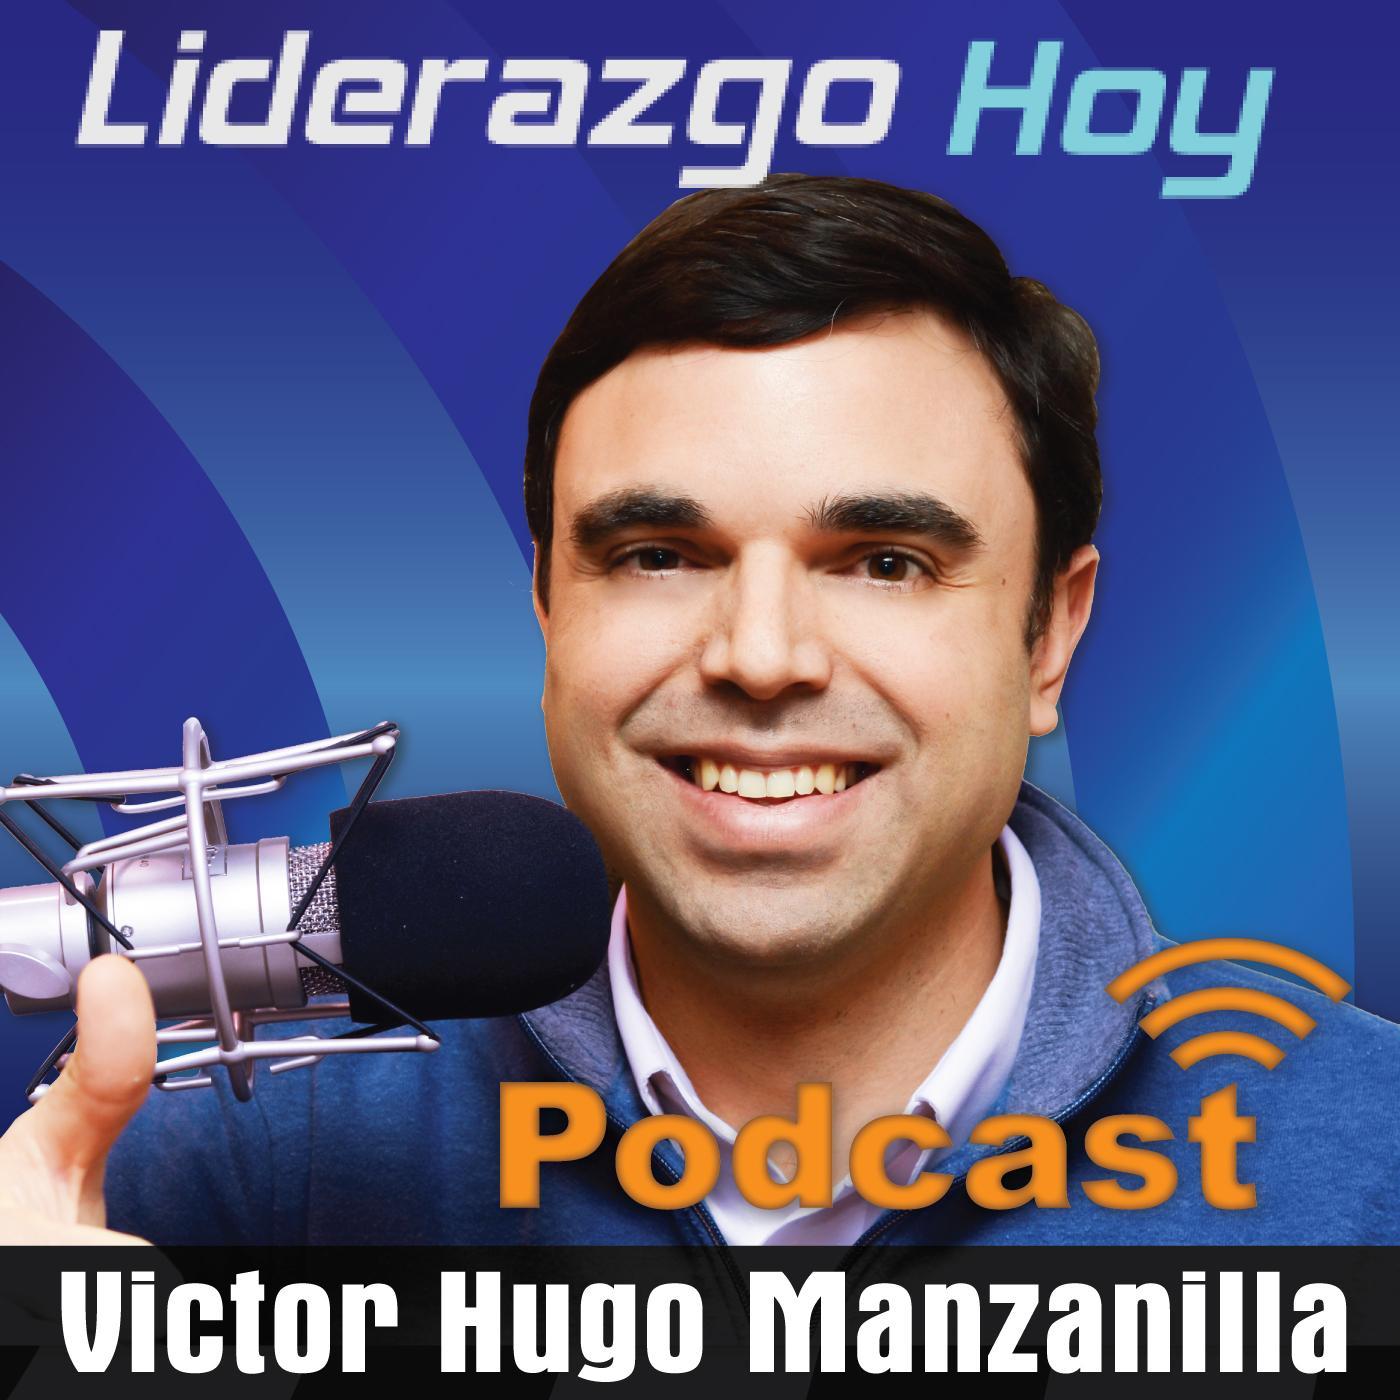 Liderazgo Hoy VICTOR HUGO MANZANILLA